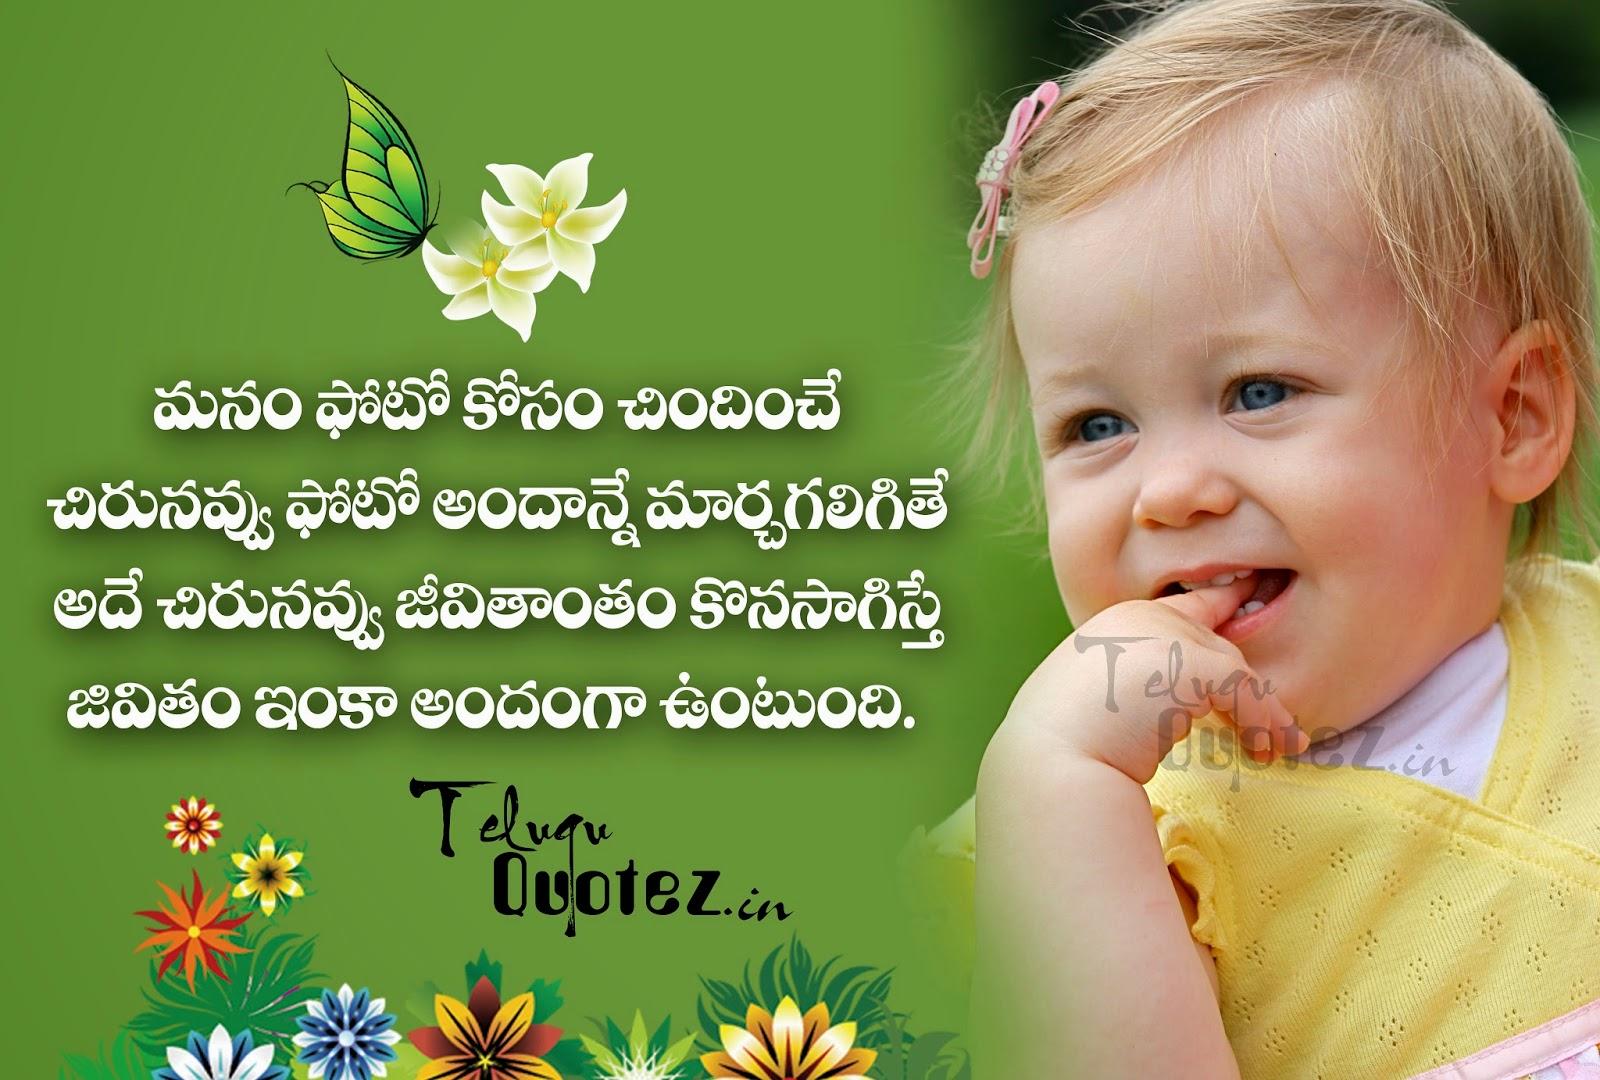 quotations on smile in telugu - photo #1